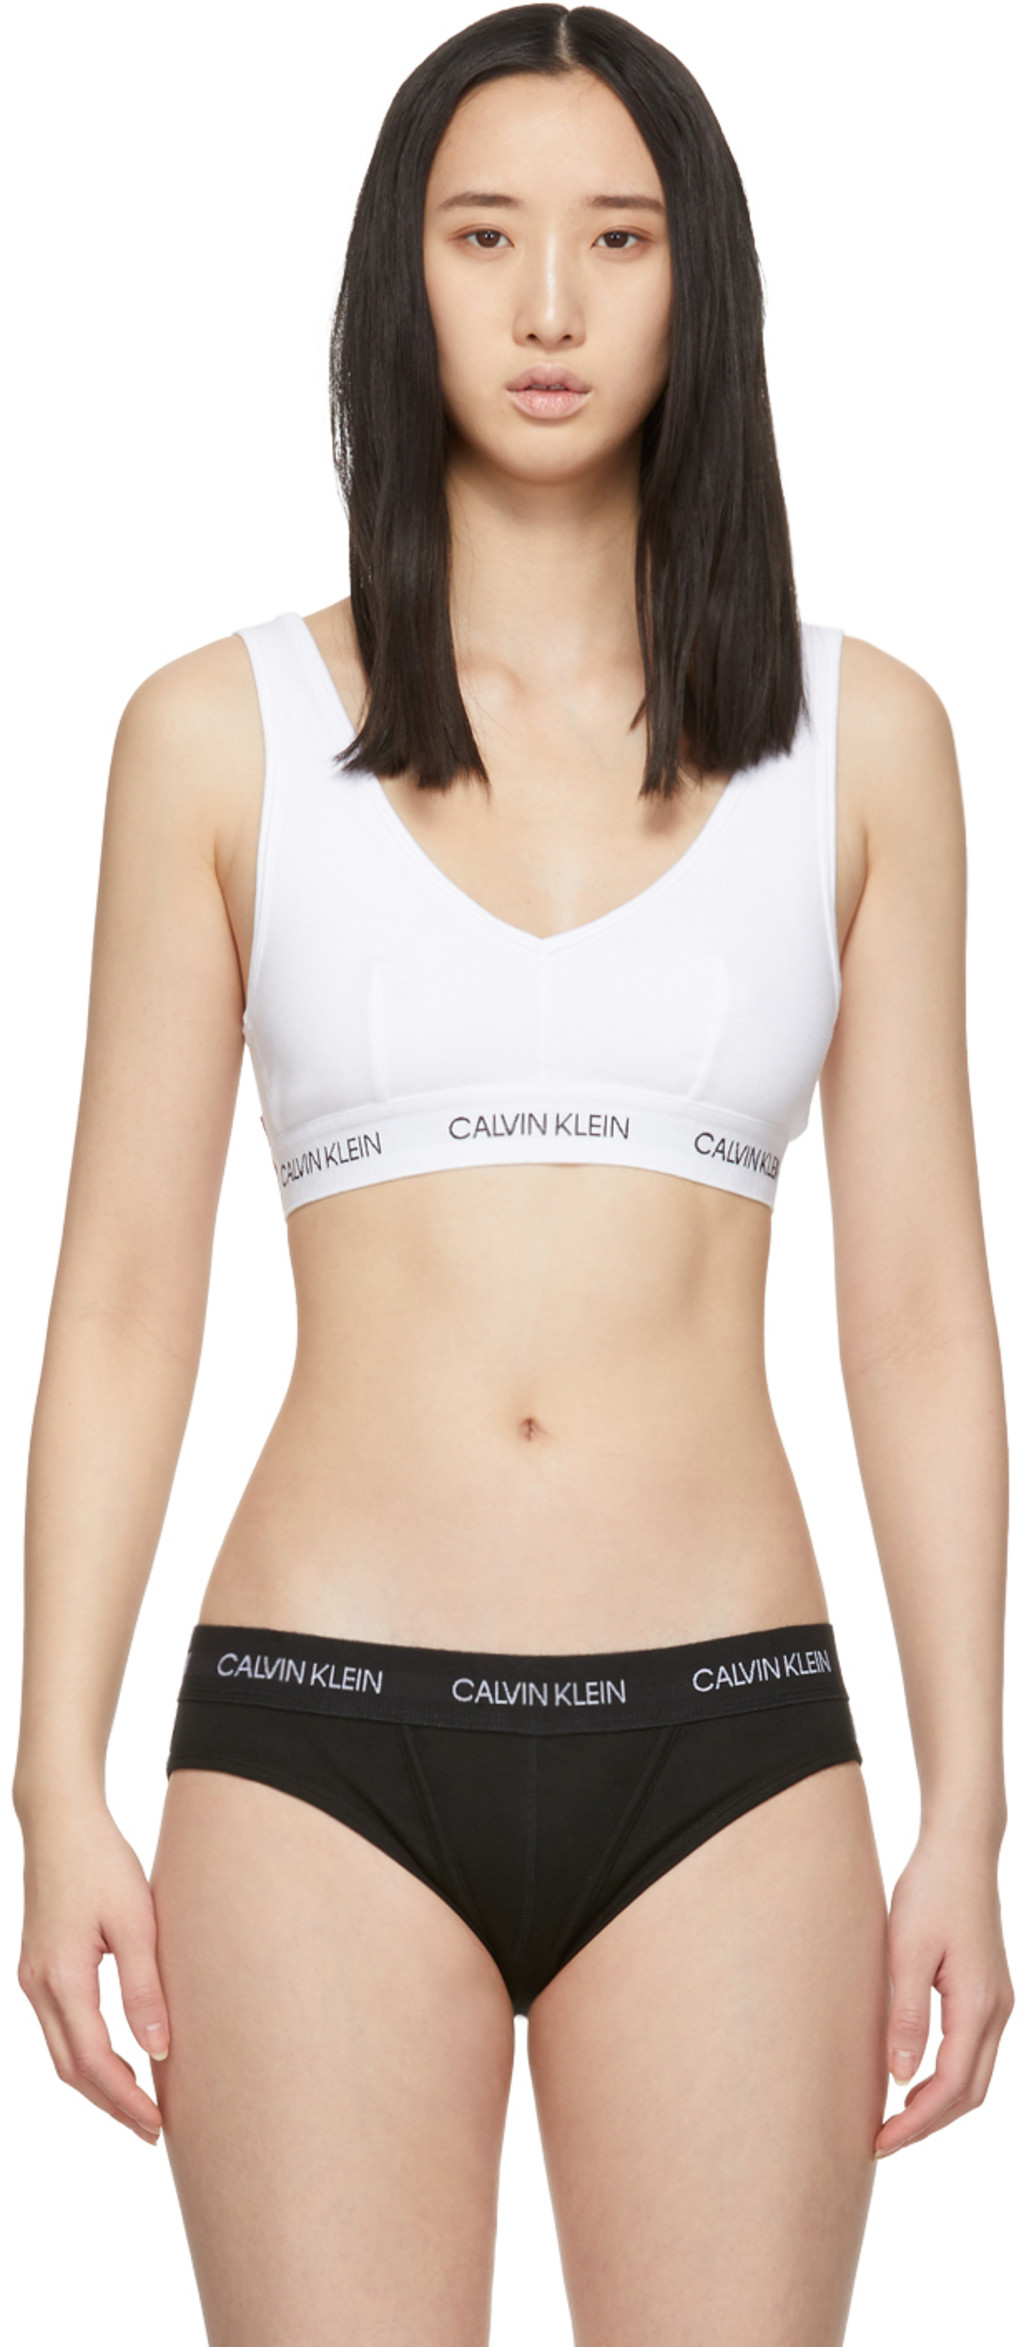 ae597f6e280 Calvin Klein Underwear for Women SS19 Collection